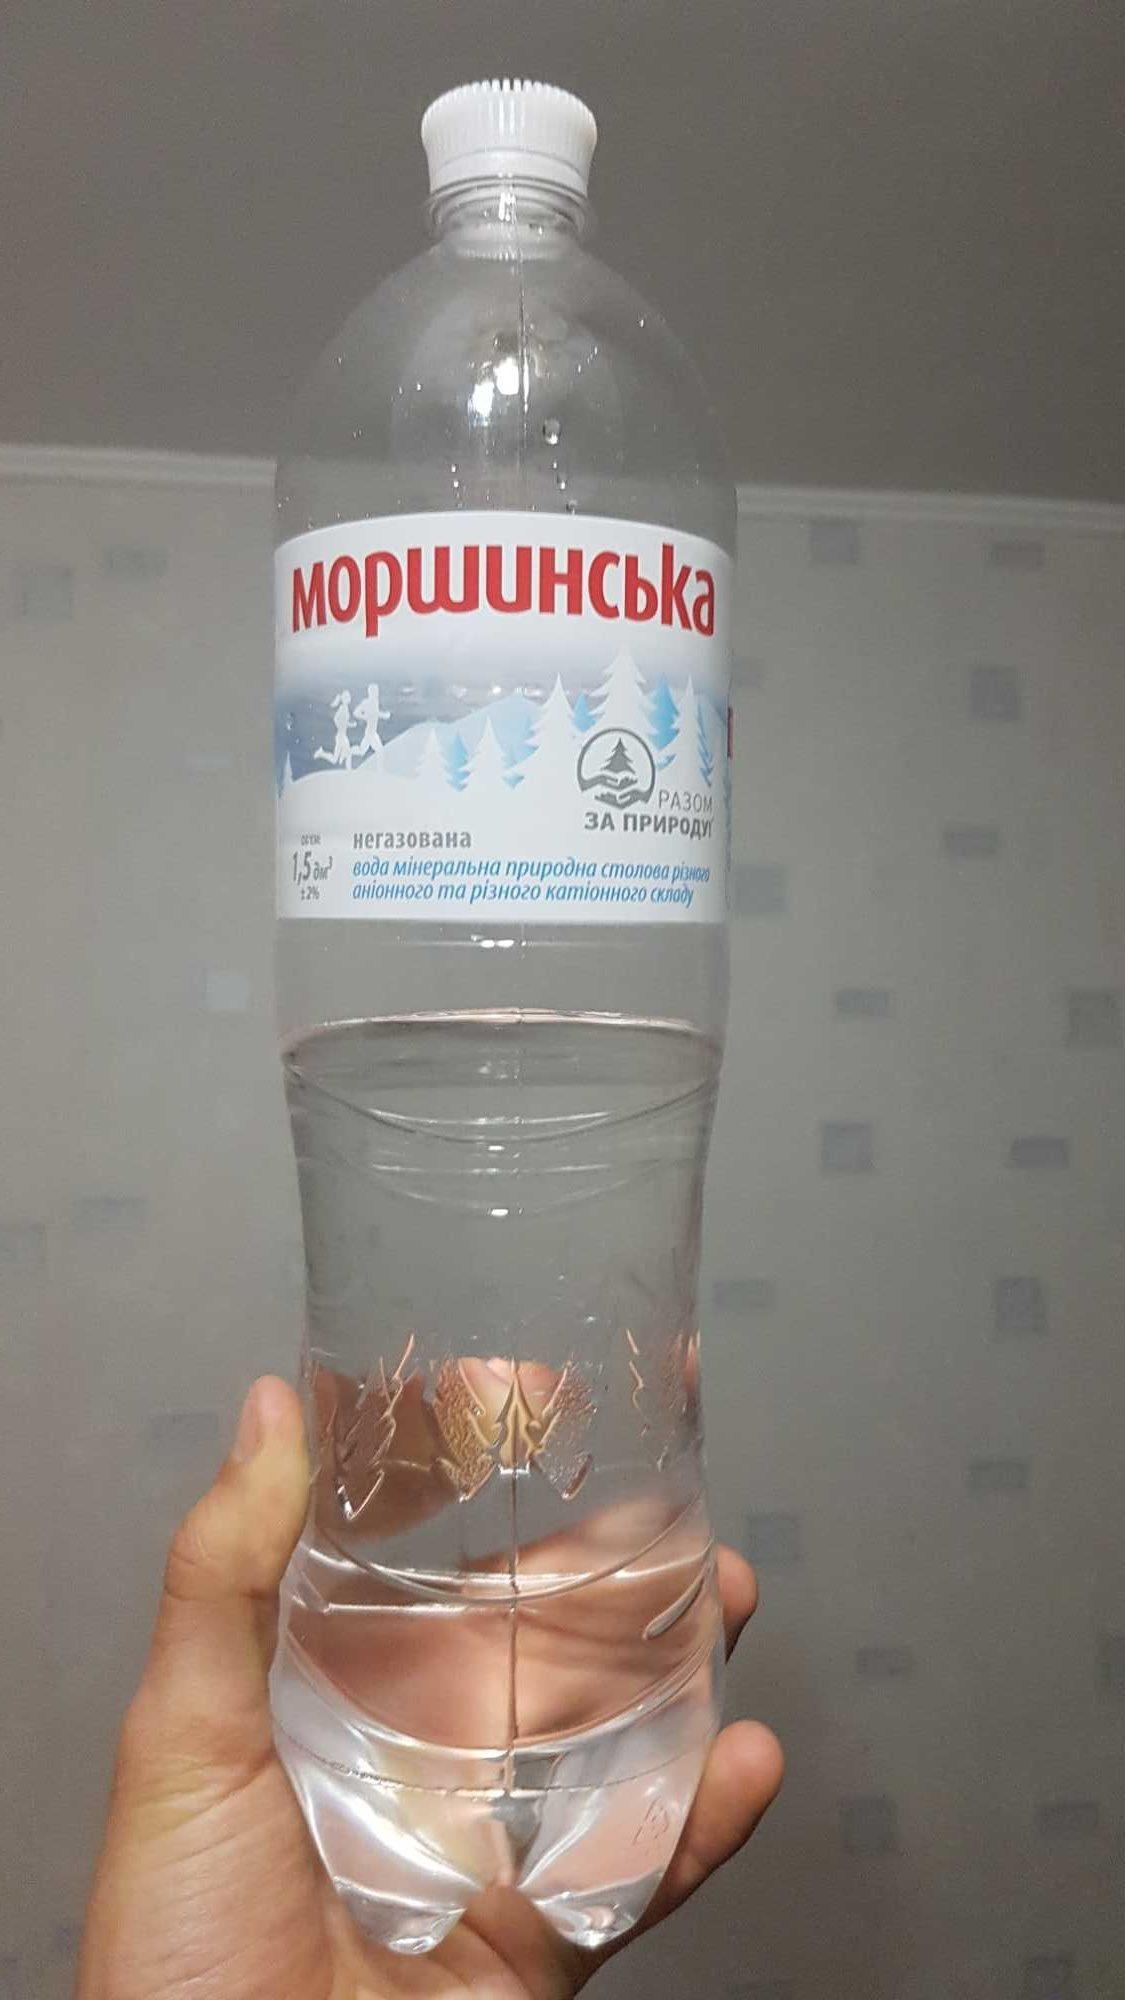 Моршинська - Product